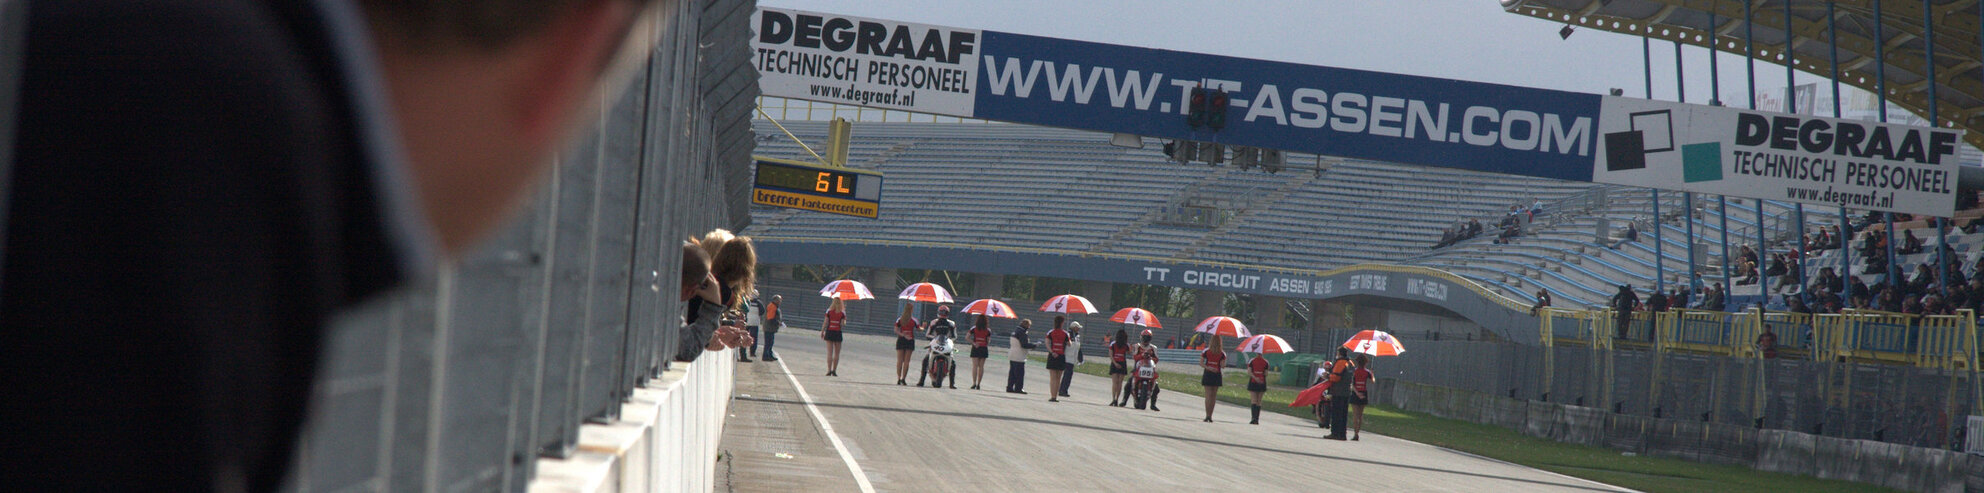 Assen - Ducati clubrace Assen - foto door Senf op 14-05-2009 - deze foto bevat: motor, circuit, ducati, assen, start, finish, pits